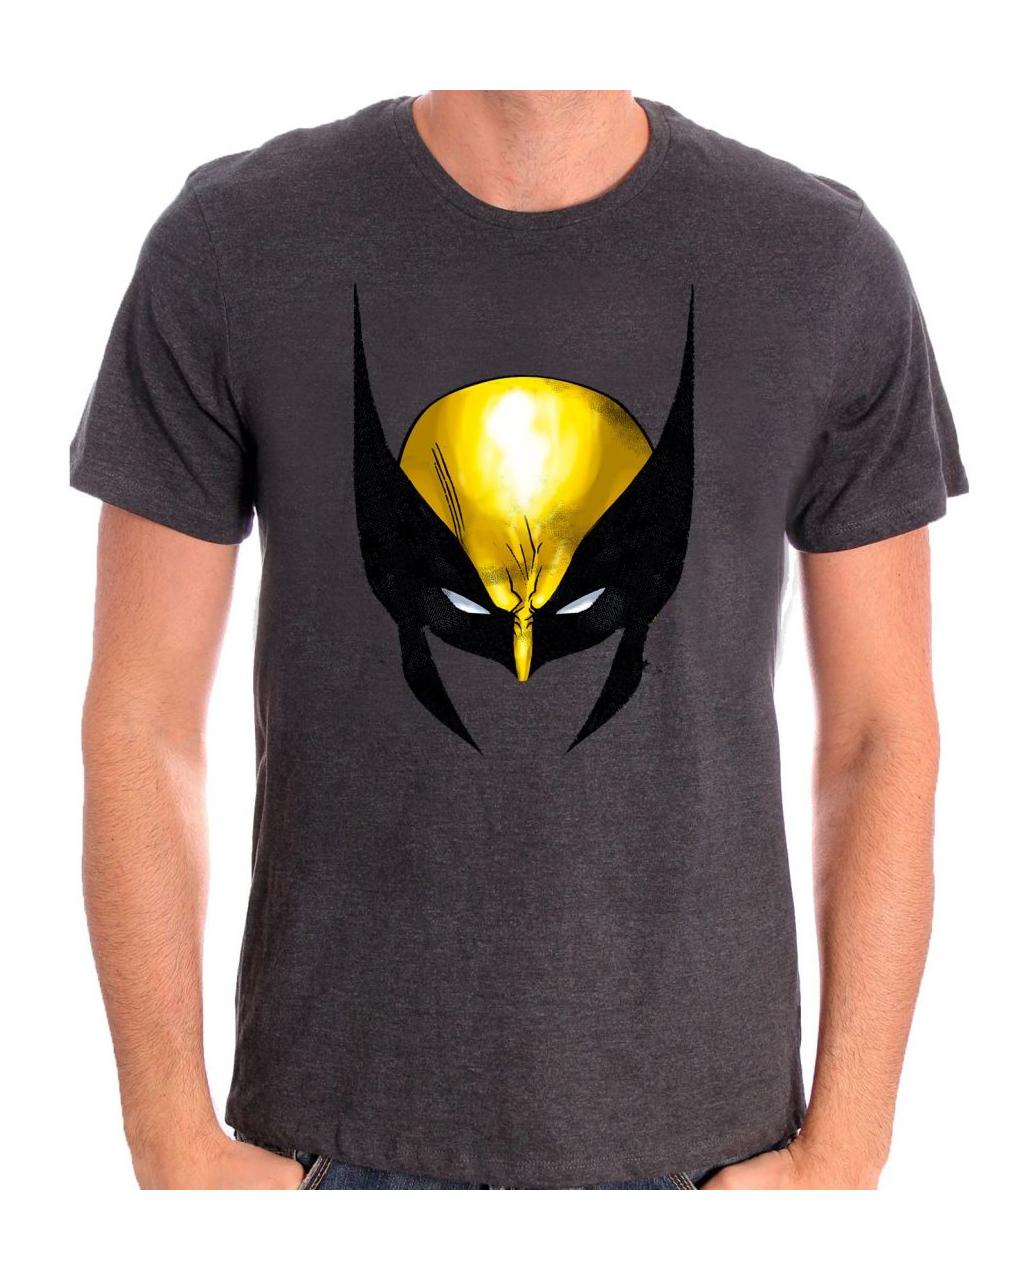 82e794d05 Wolverine Mask Motif T-Shirt for superheroes | horror-shop.com